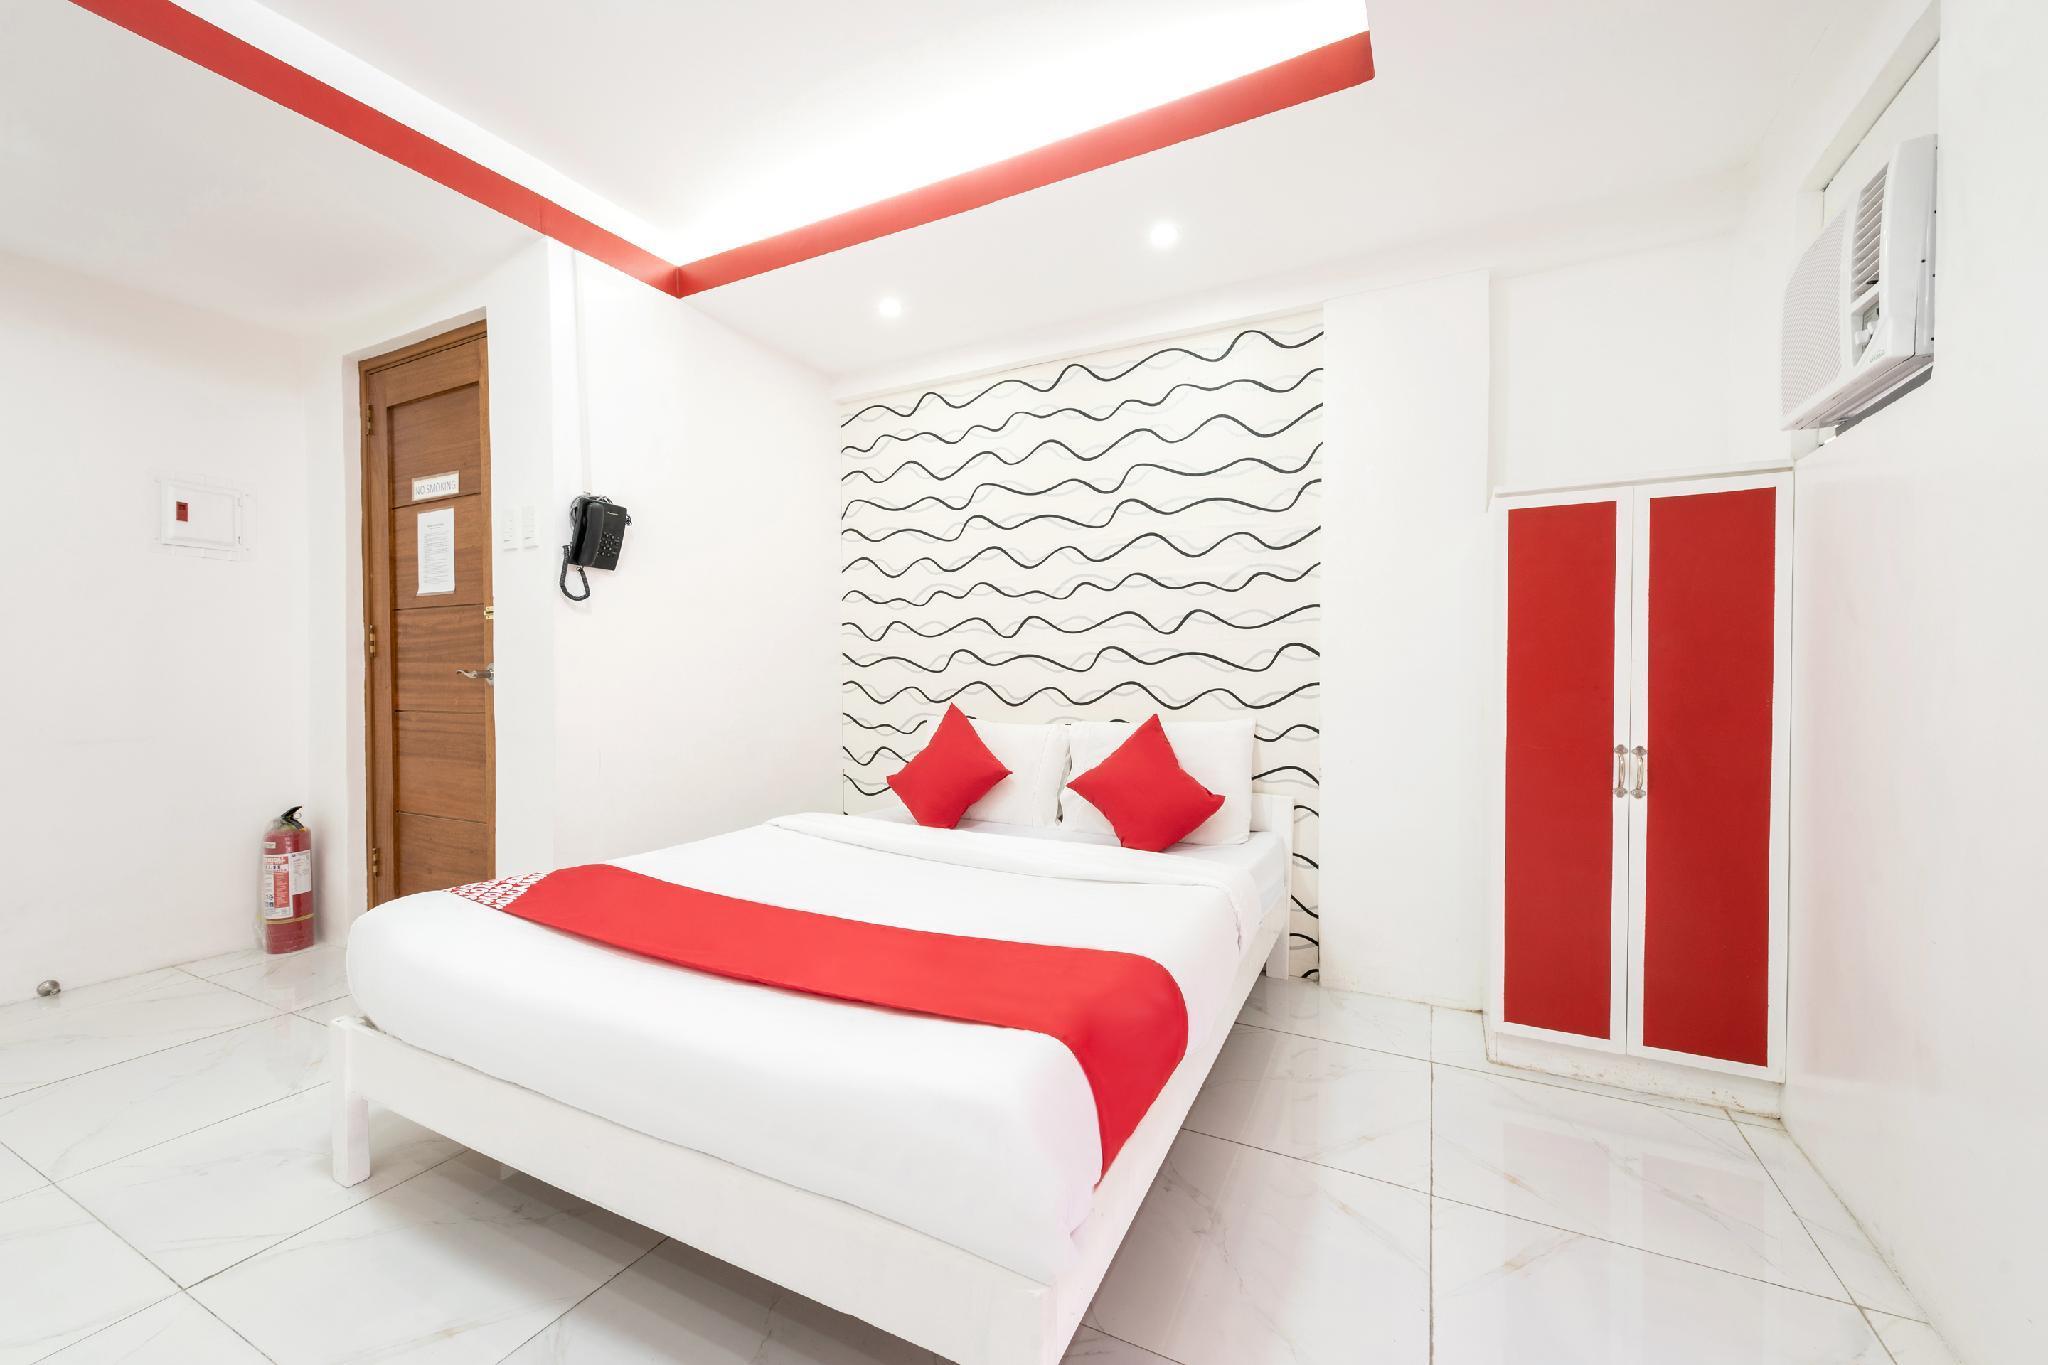 D Builders Rooms New Lower Bicutan